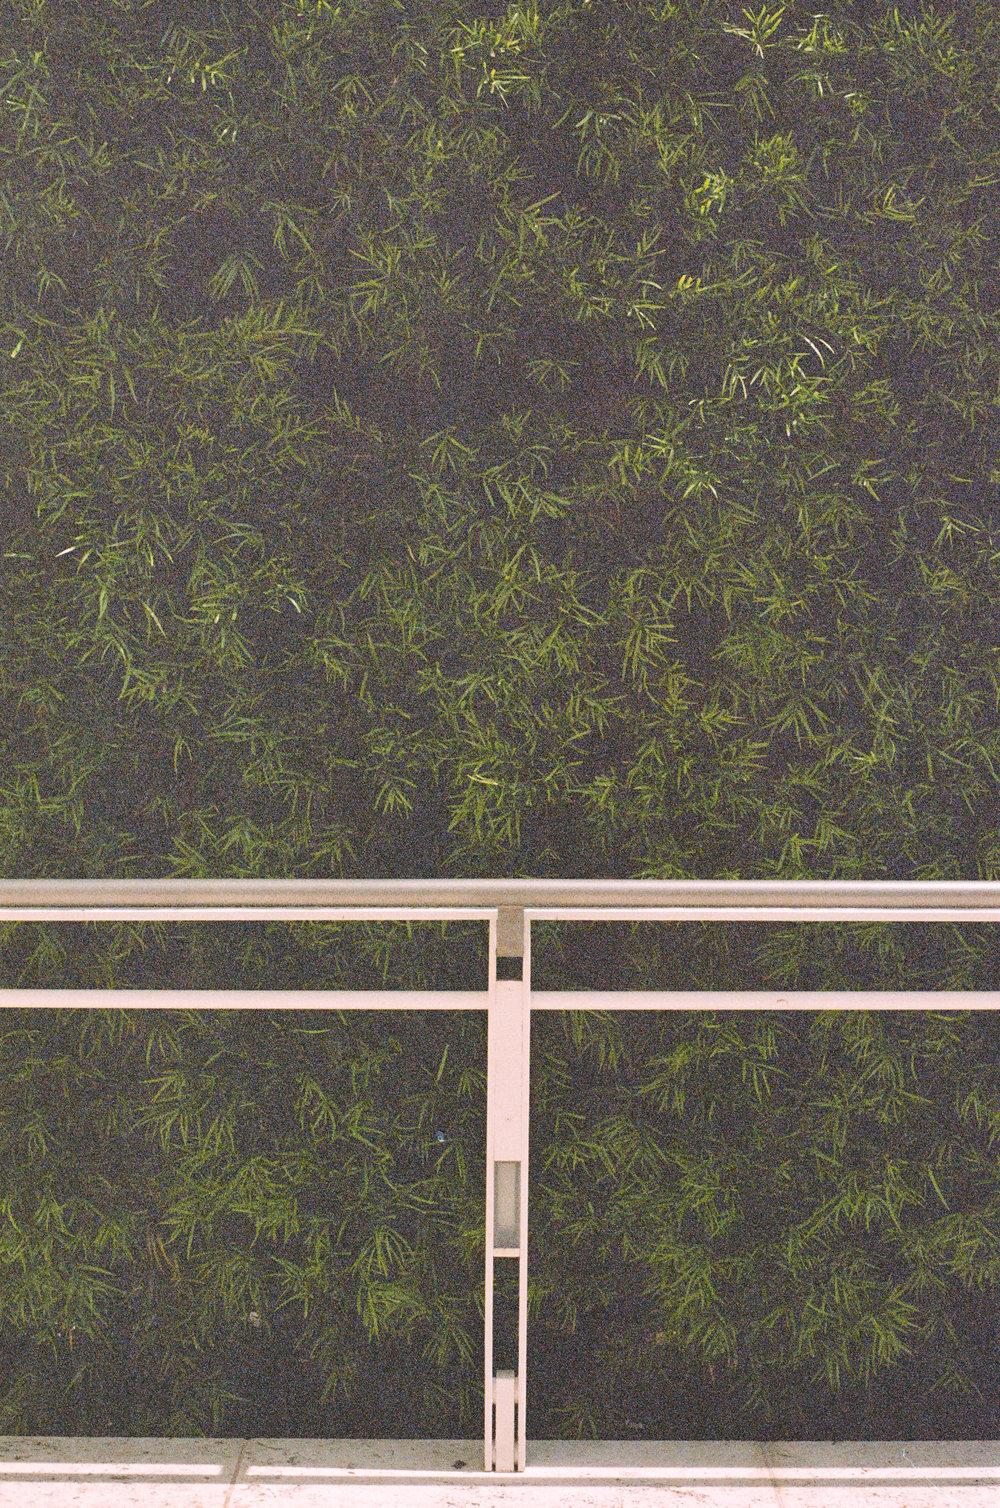 getty-hedge-film.jpg